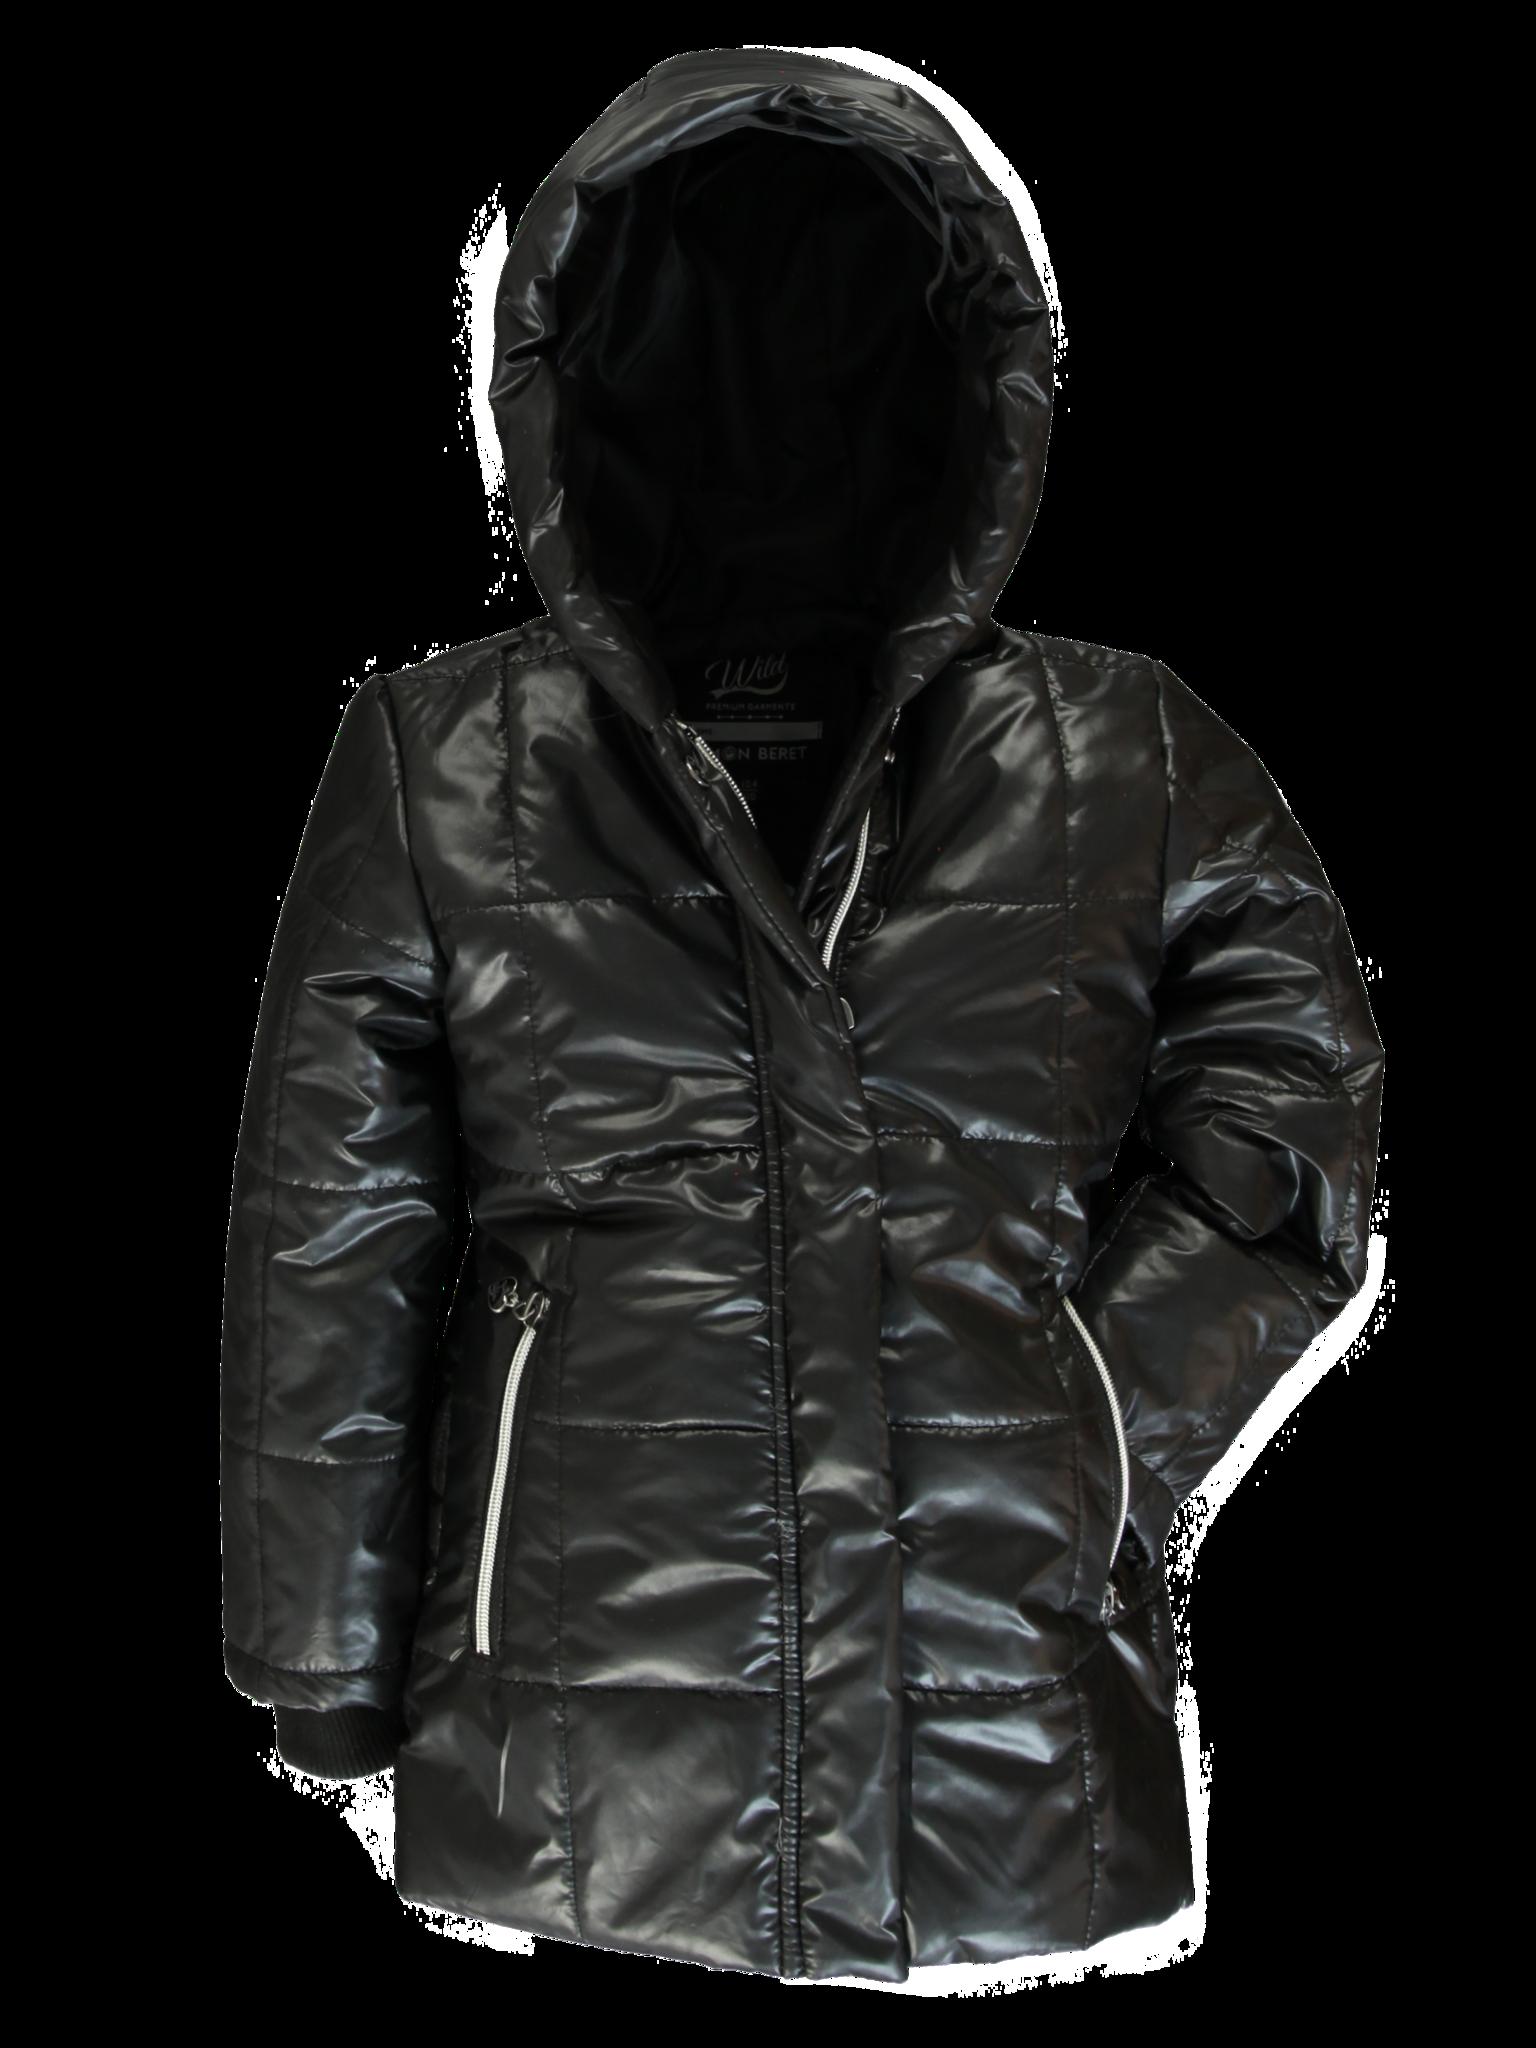 All Brands | Winterproducts Small Girls | Jacket | 10 pcs/box